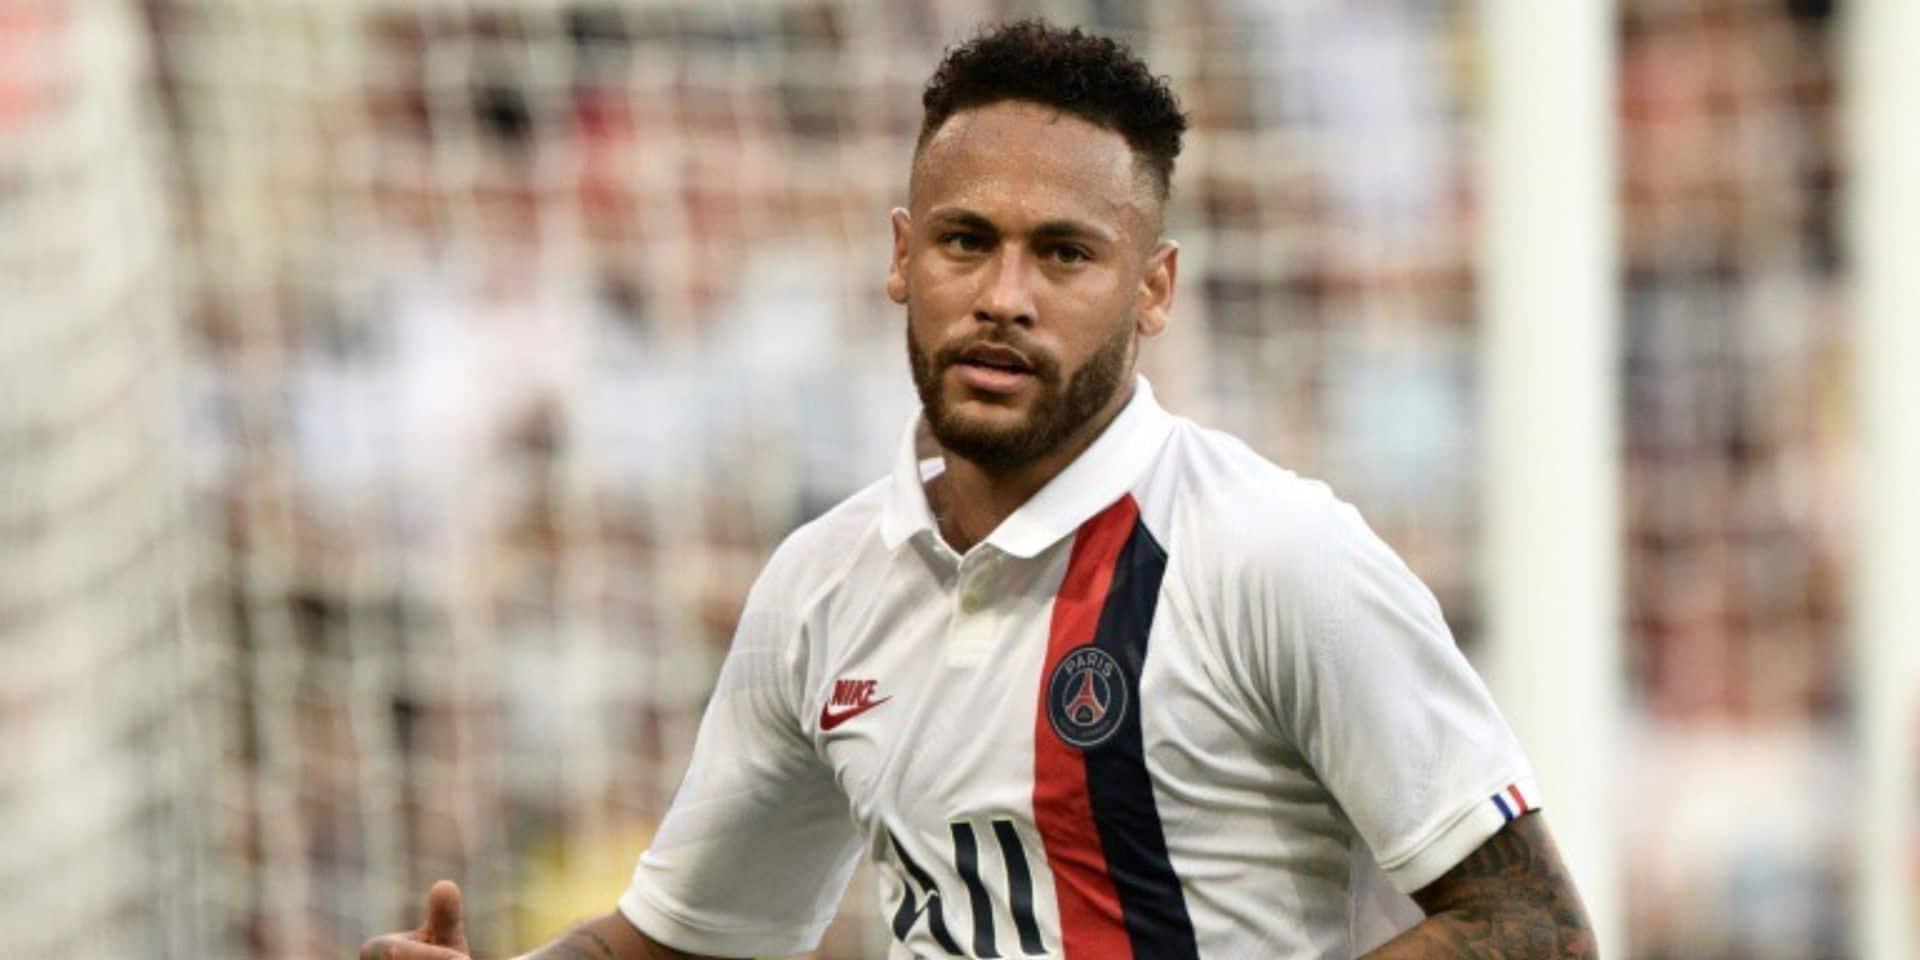 Le Paris Saint-Germain affrontera en amical ... Waasland-Beveren